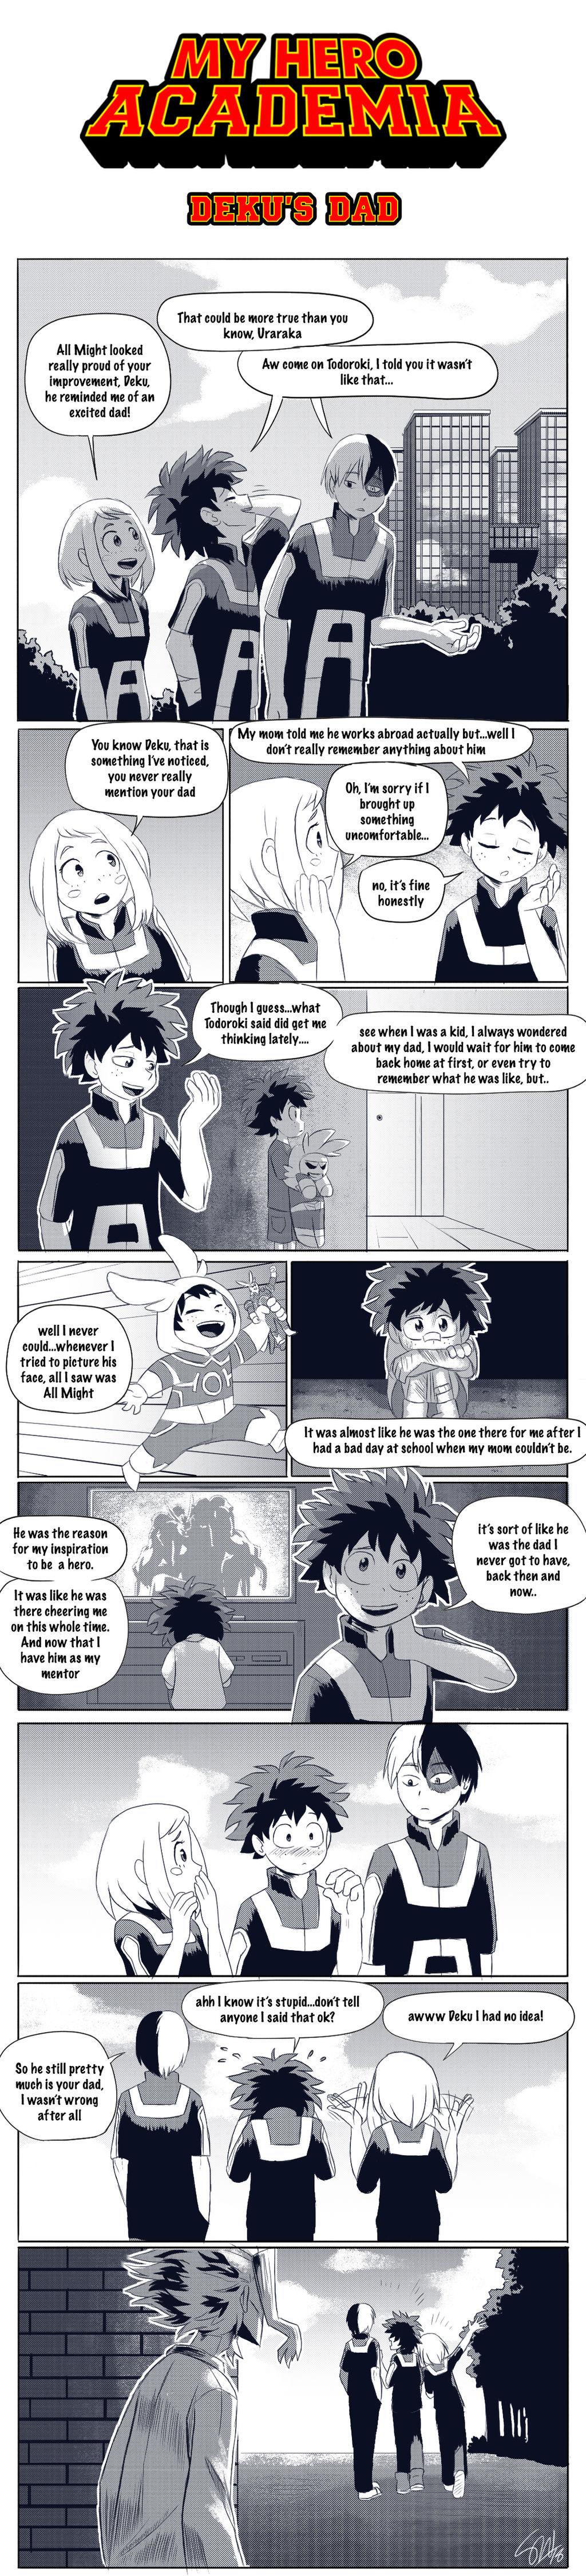 Boku No Hero Academia - Deku's Dad by TC-96 on DeviantArt